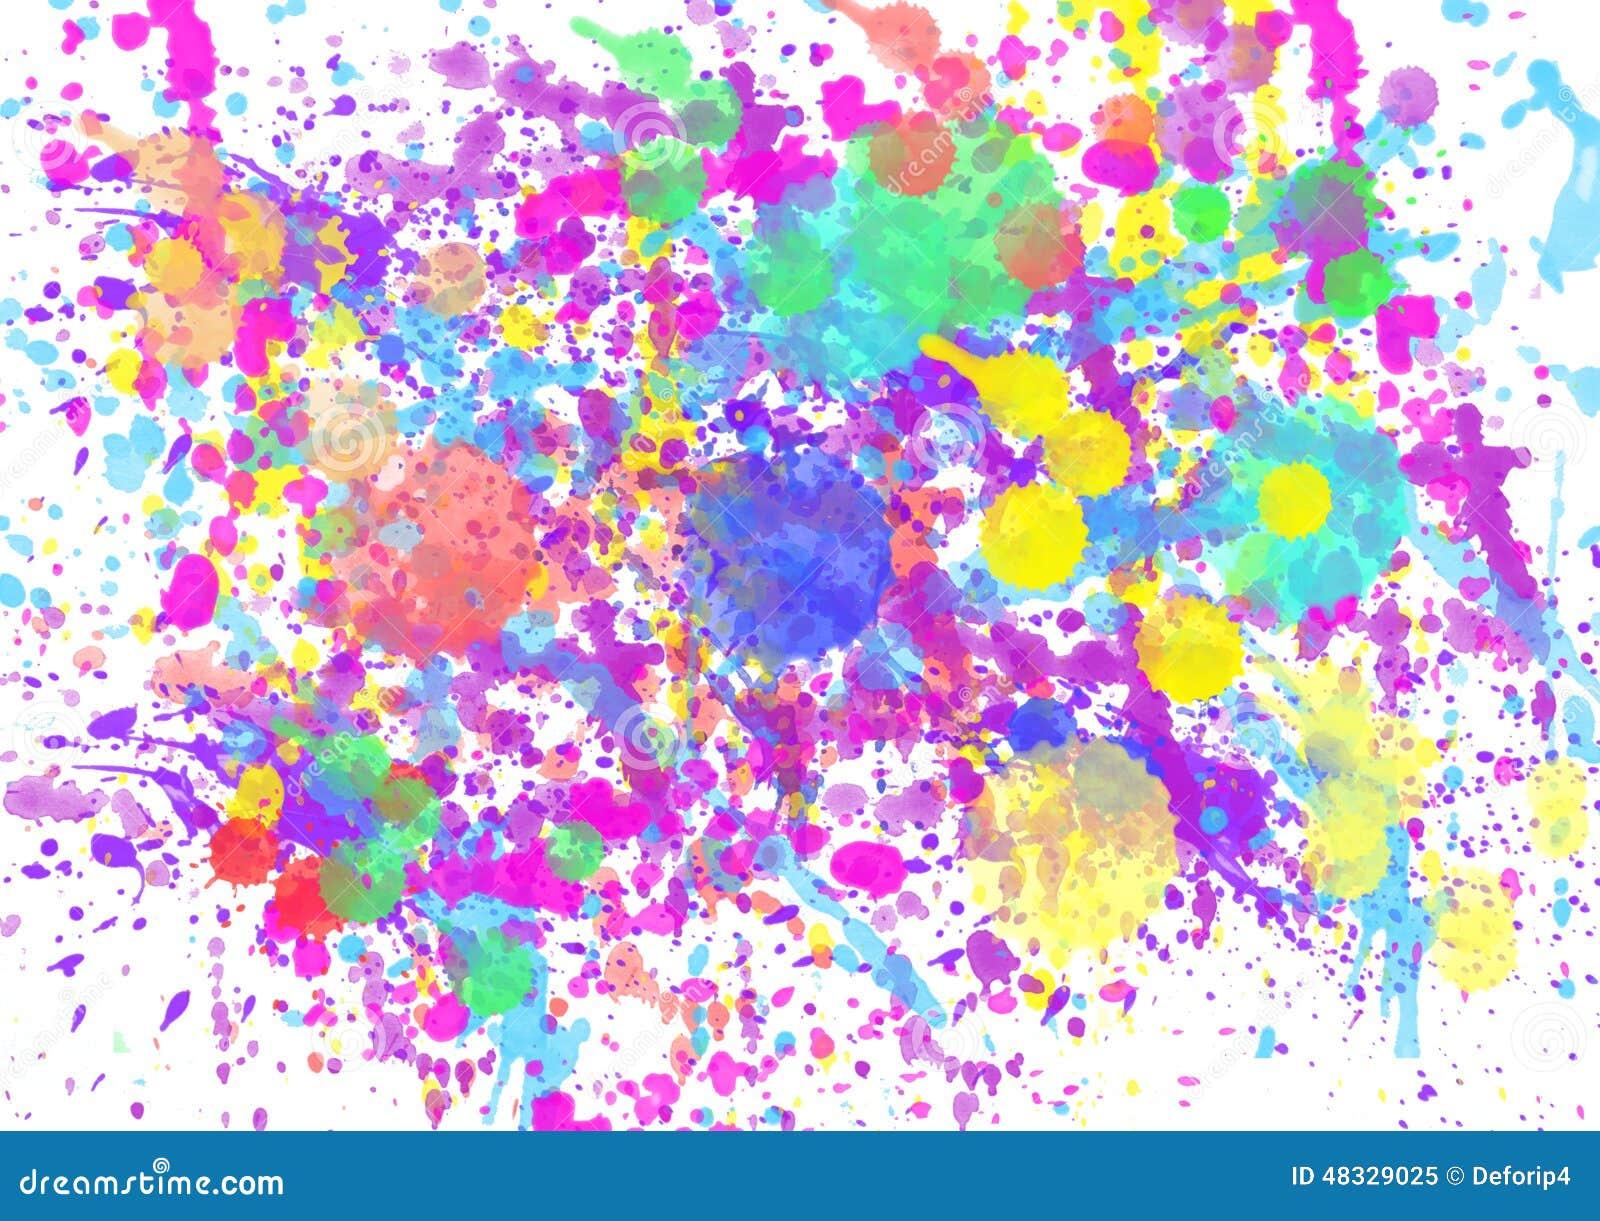 paint watercolor splatter spray stock illustration image 48329025. Black Bedroom Furniture Sets. Home Design Ideas